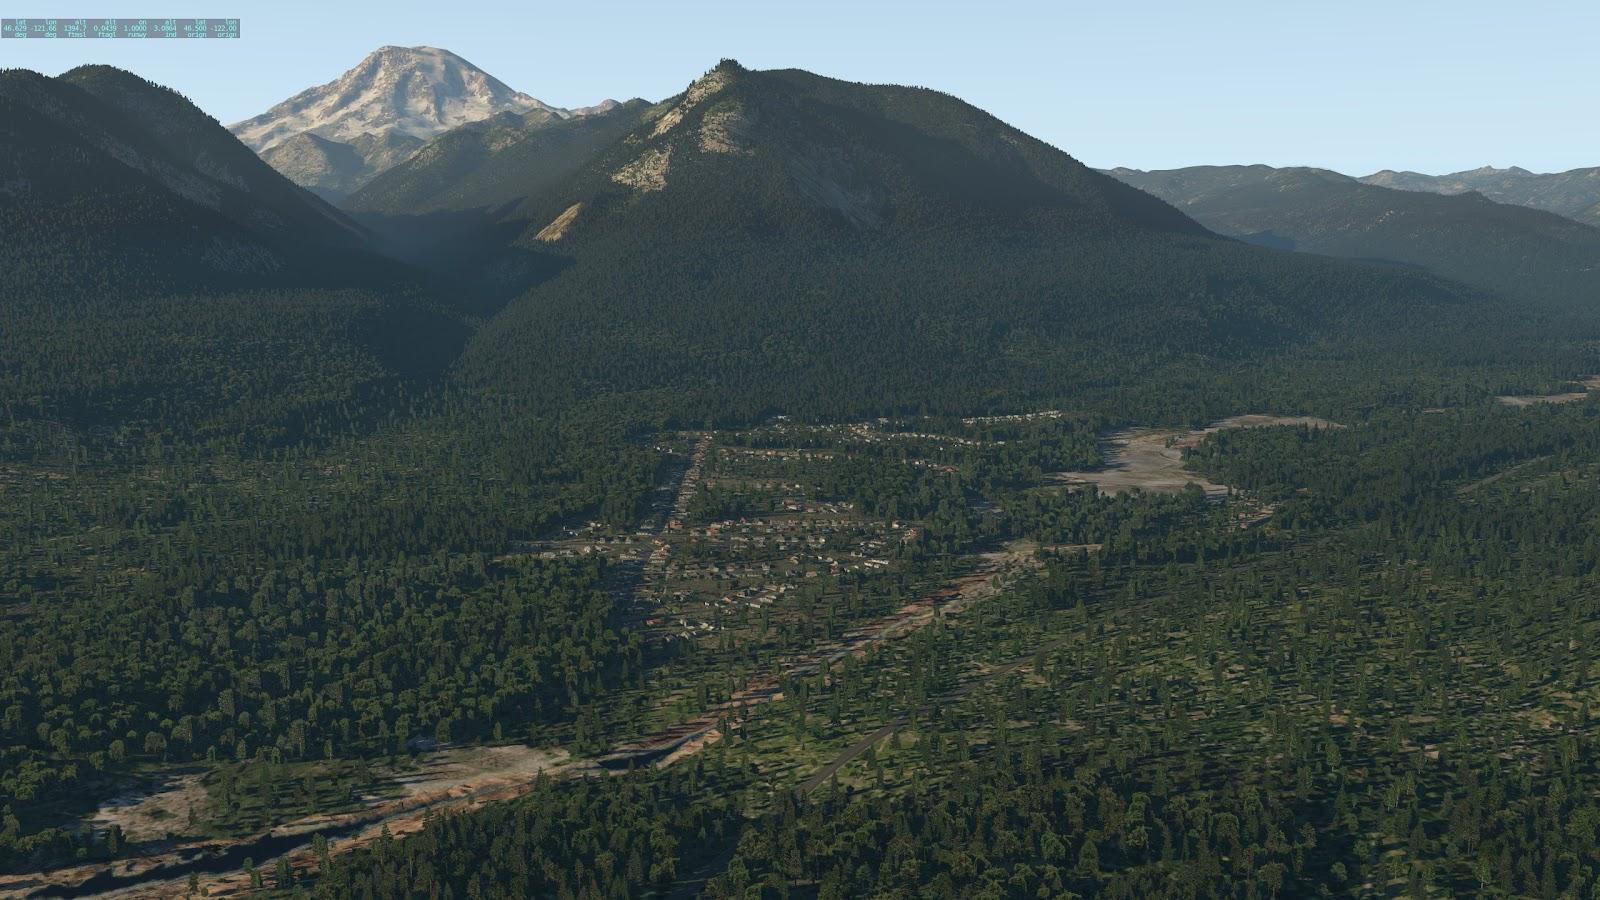 HD Mesh Scenery v4 (for X-Plane 11) - COMPARISON shots